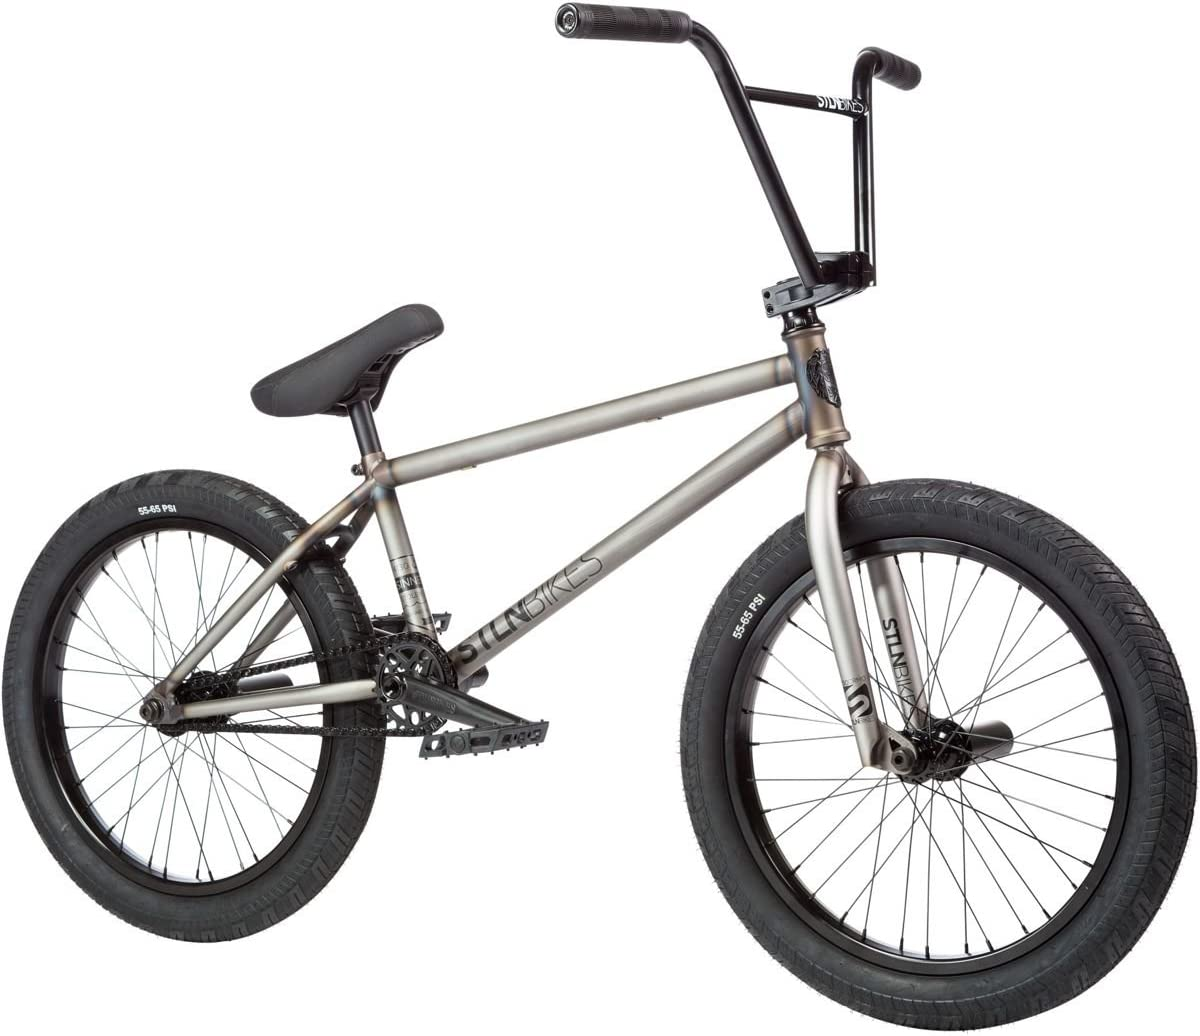 Stolen Sinner XLT BMX bicicleta tubo superior 2017 21